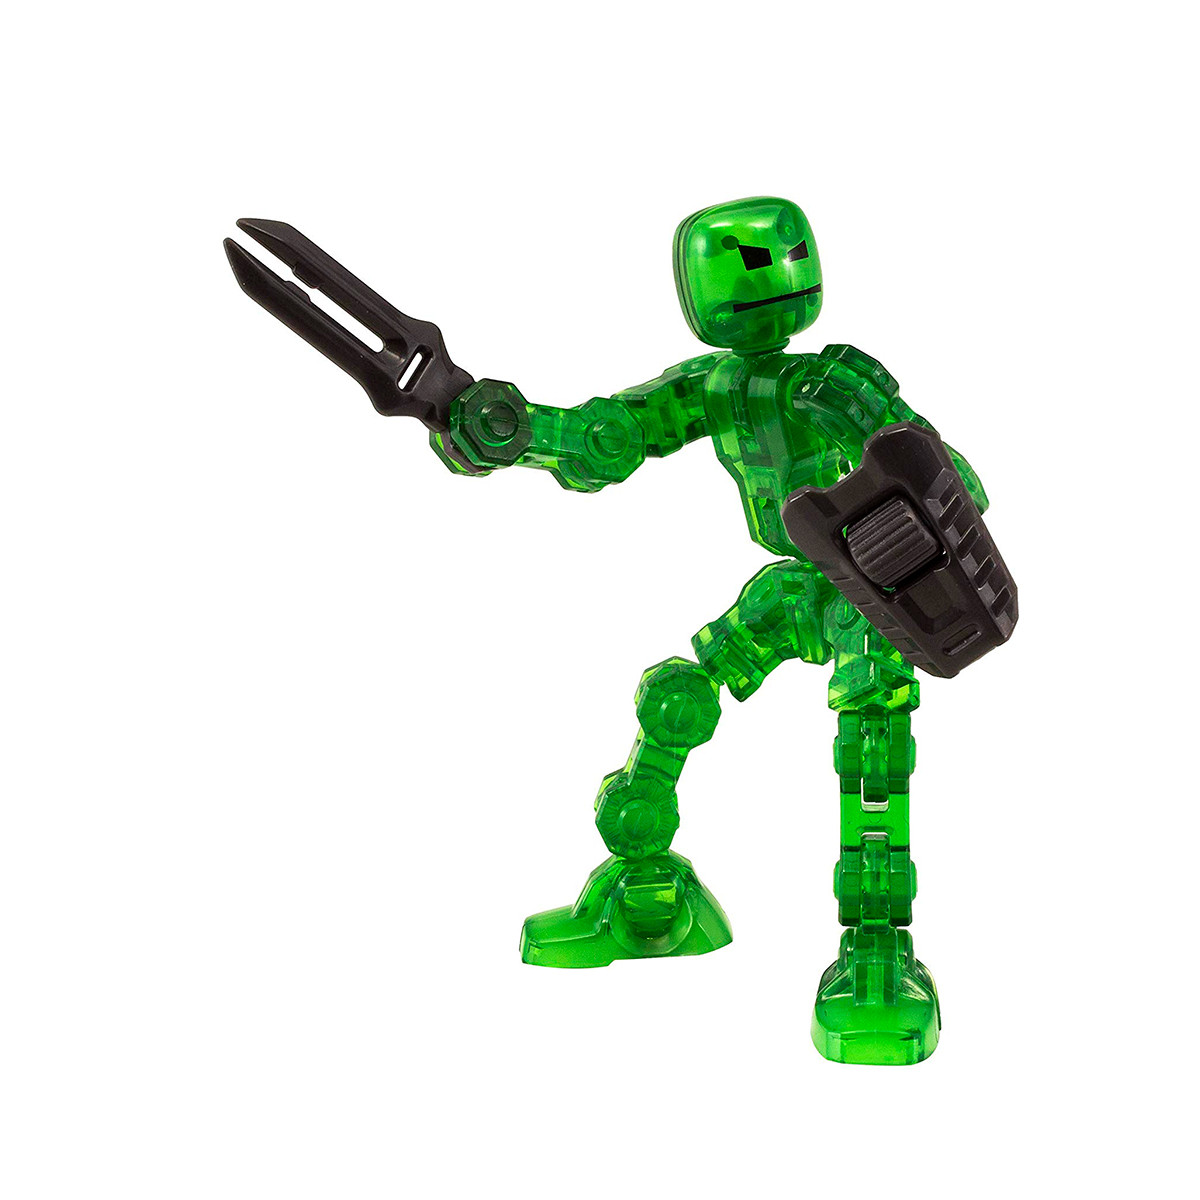 Игровая фигурка Кликбот (Klikbot) S1 (зелёный) ОРИГИНАЛ